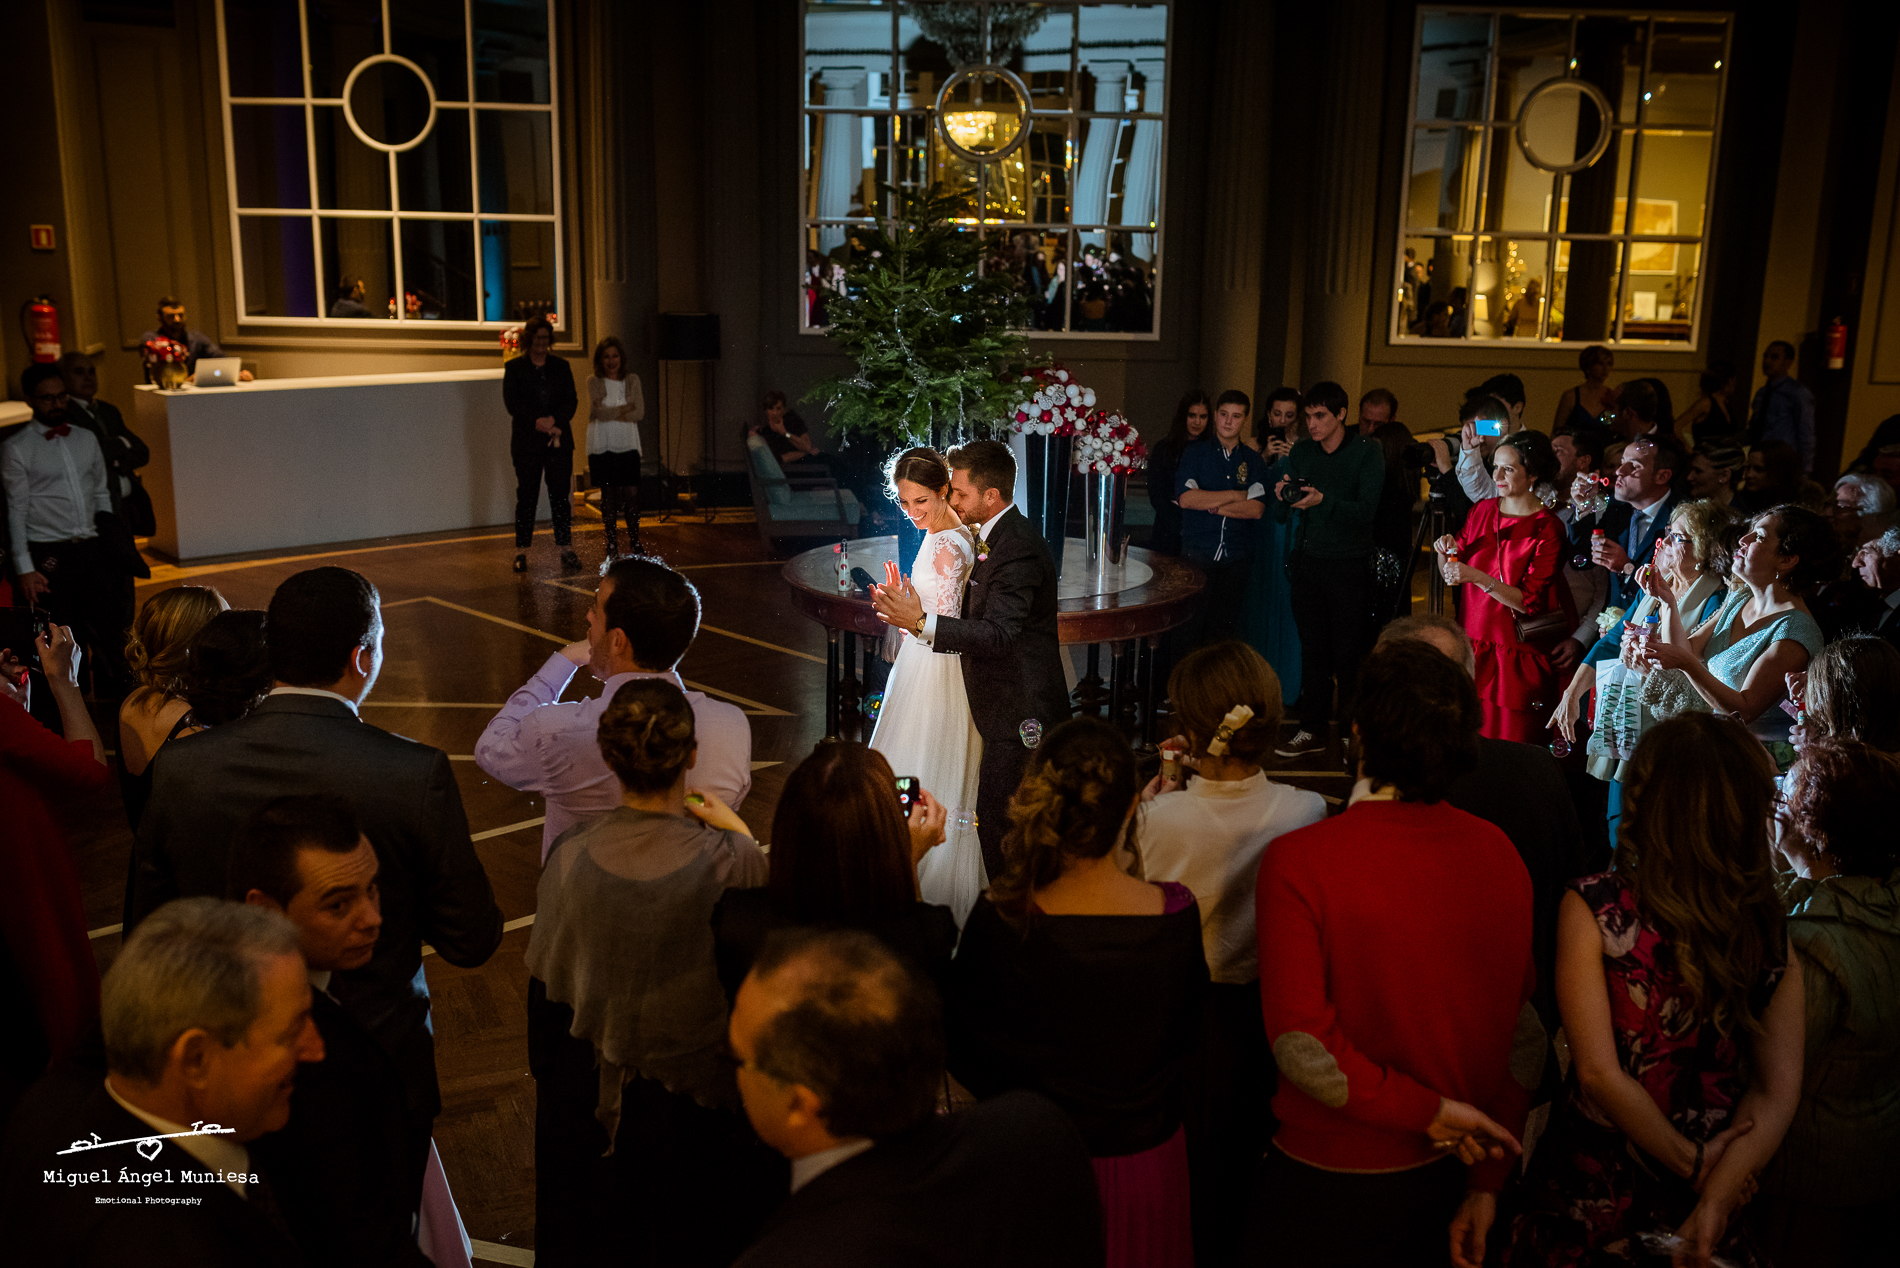 miguel angel muniesa, fotografo boda Teruel, fotografo boda navarra, fotografo boda zaragoza, fotografo boda soria, miguel angel muniesa emotional photography_24